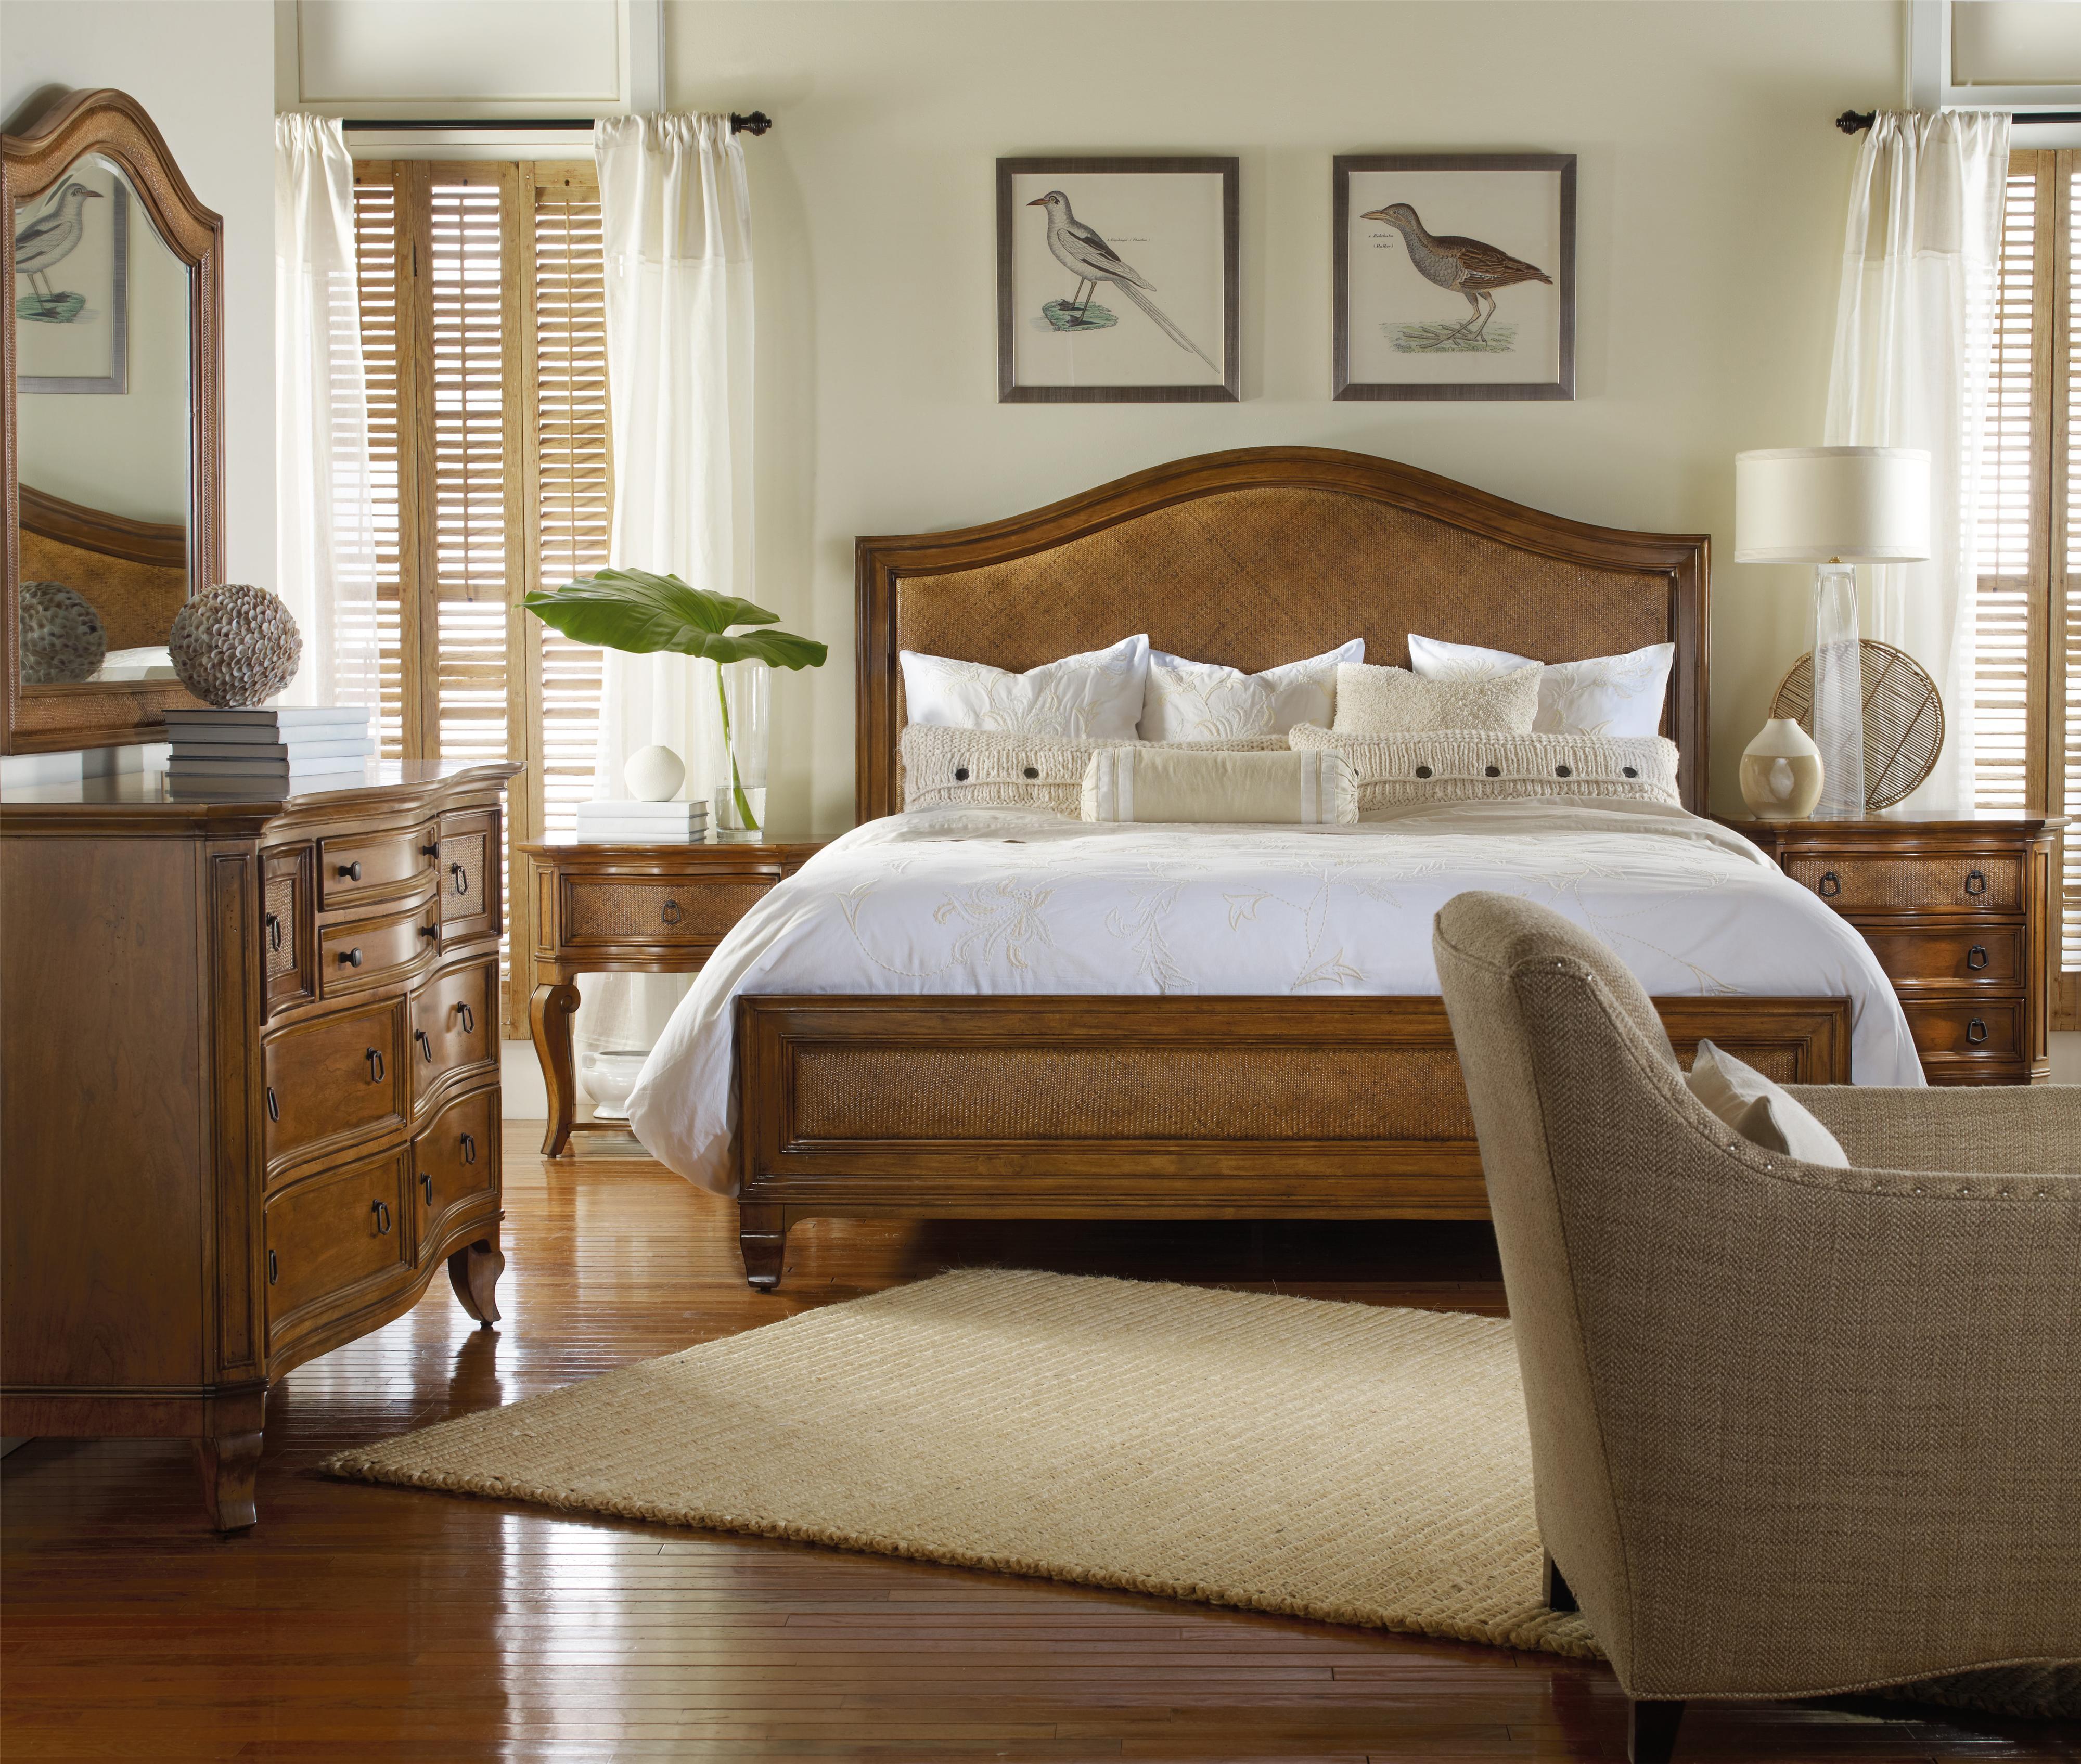 armoire iteminformation hooker bedroom visage furniture sanctuary